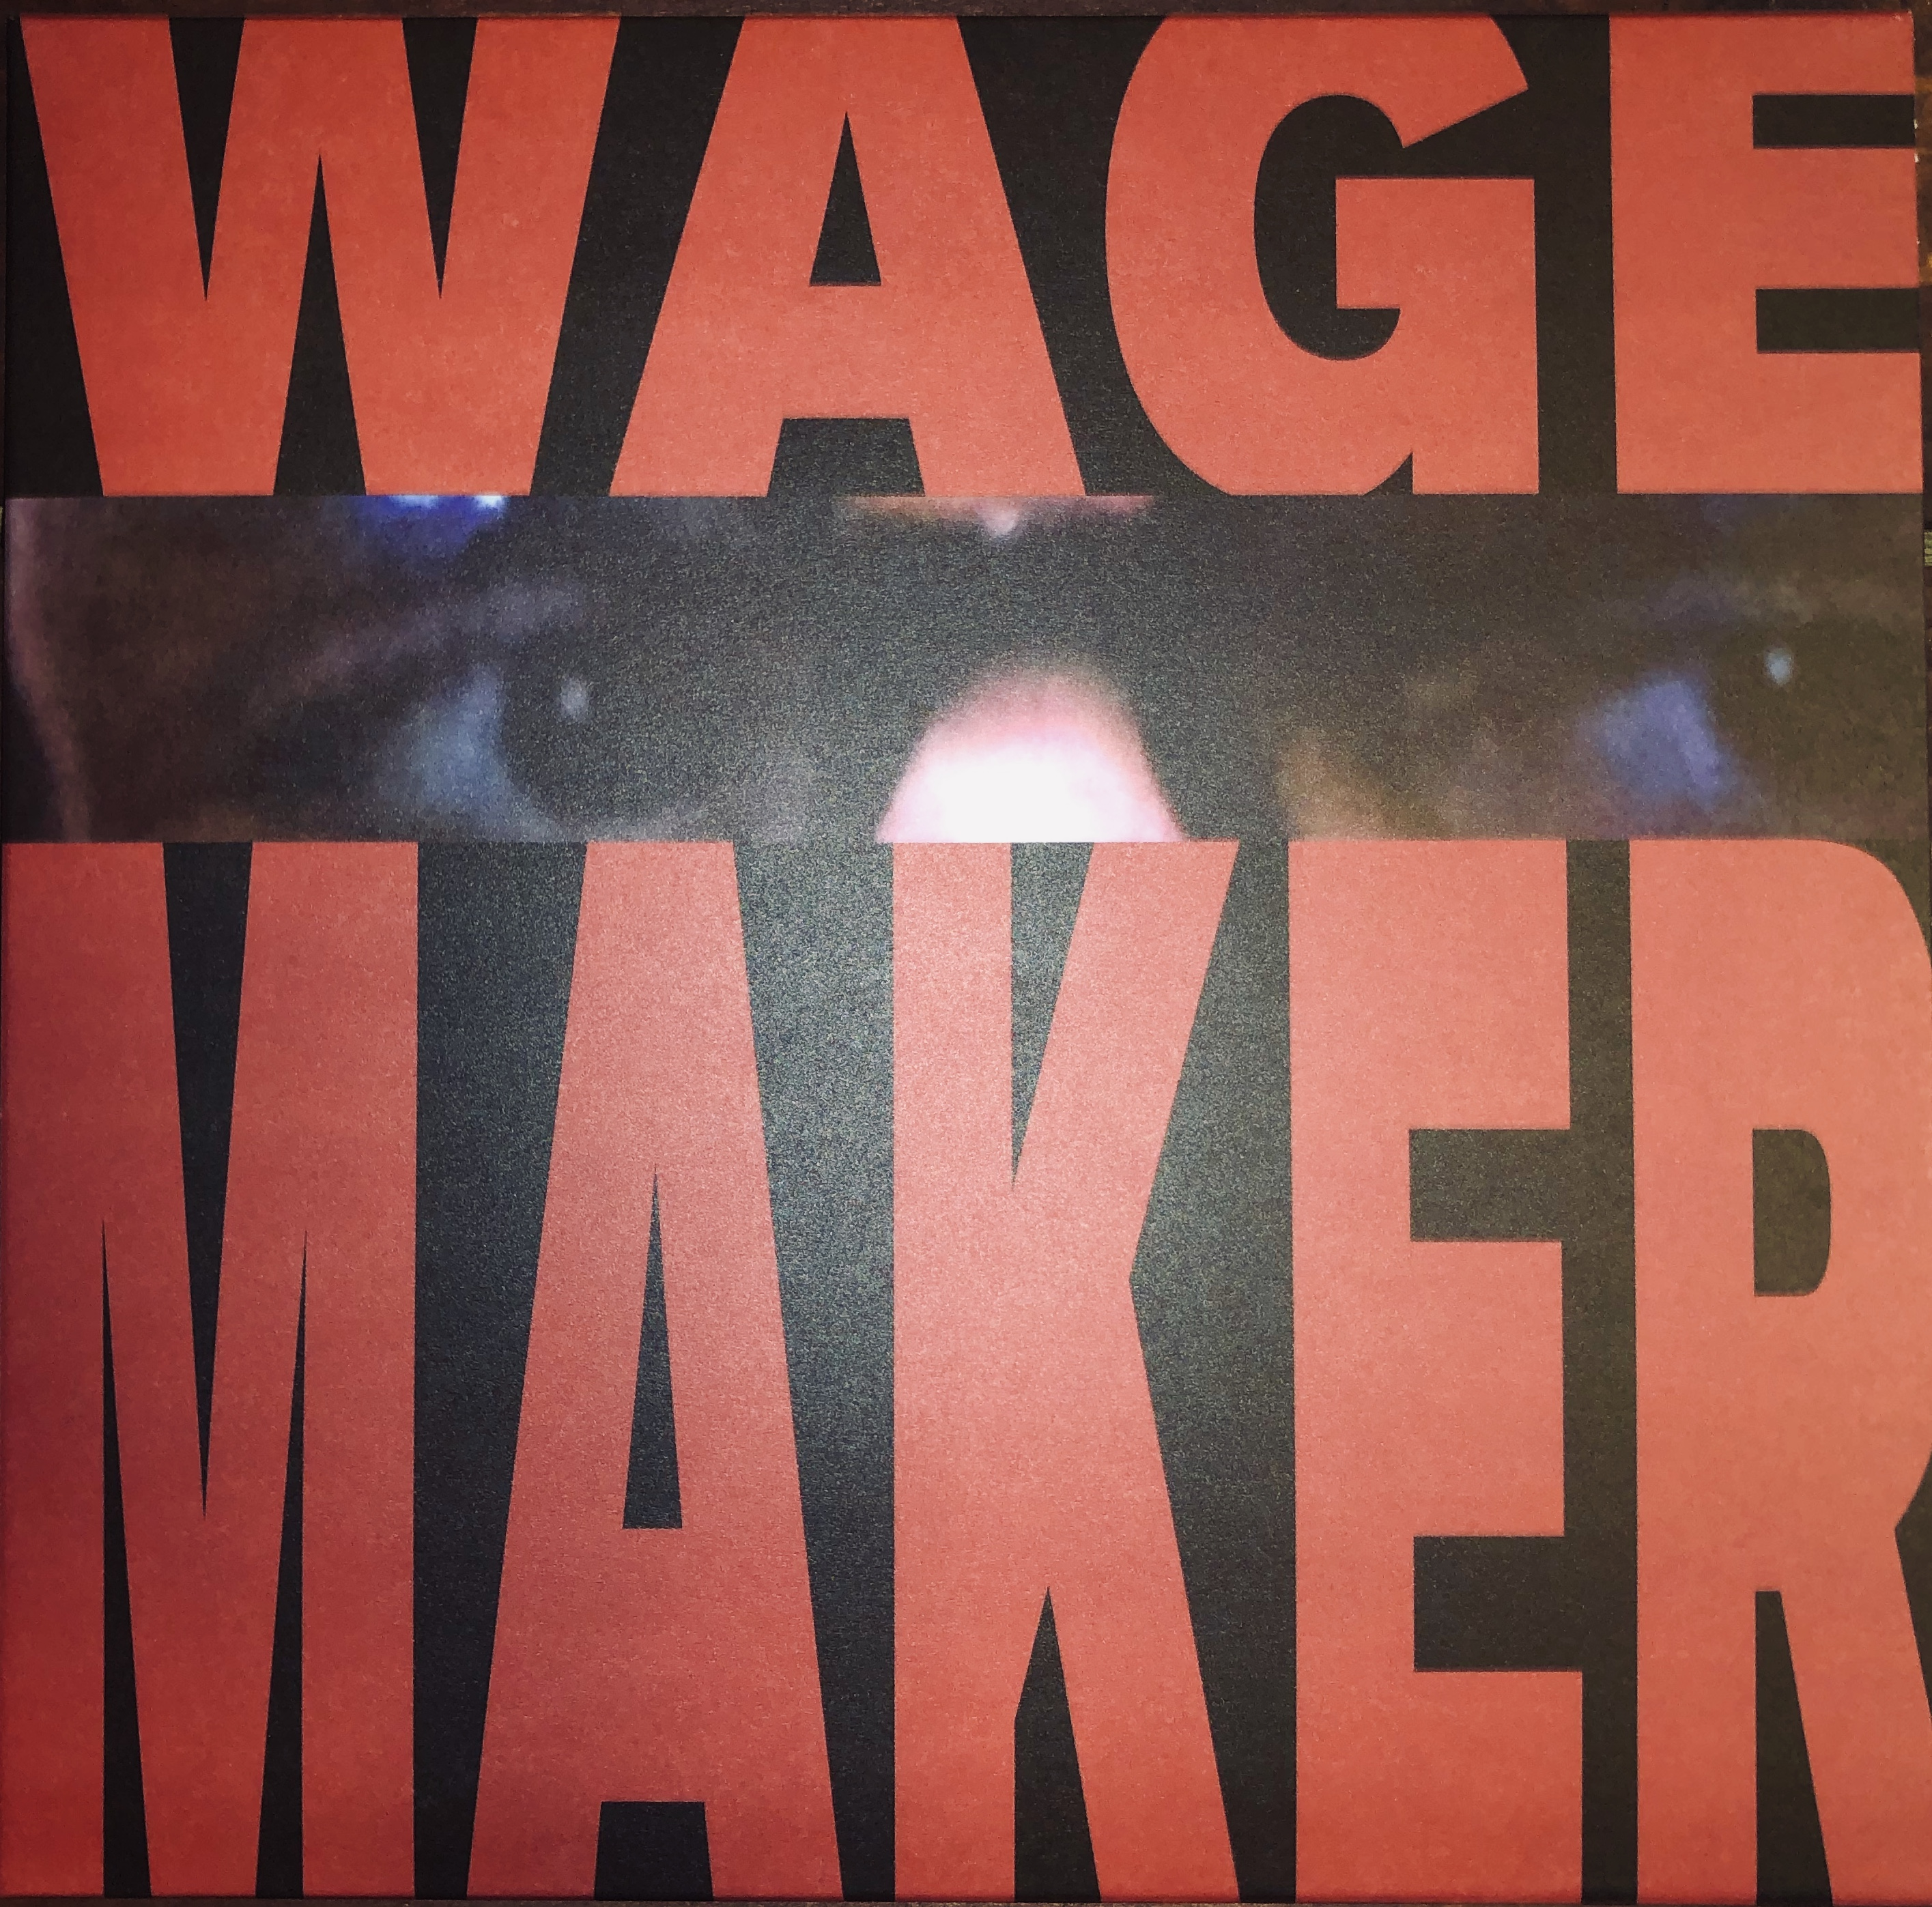 WAGEMAKER - WageMaker PRE-ORDER